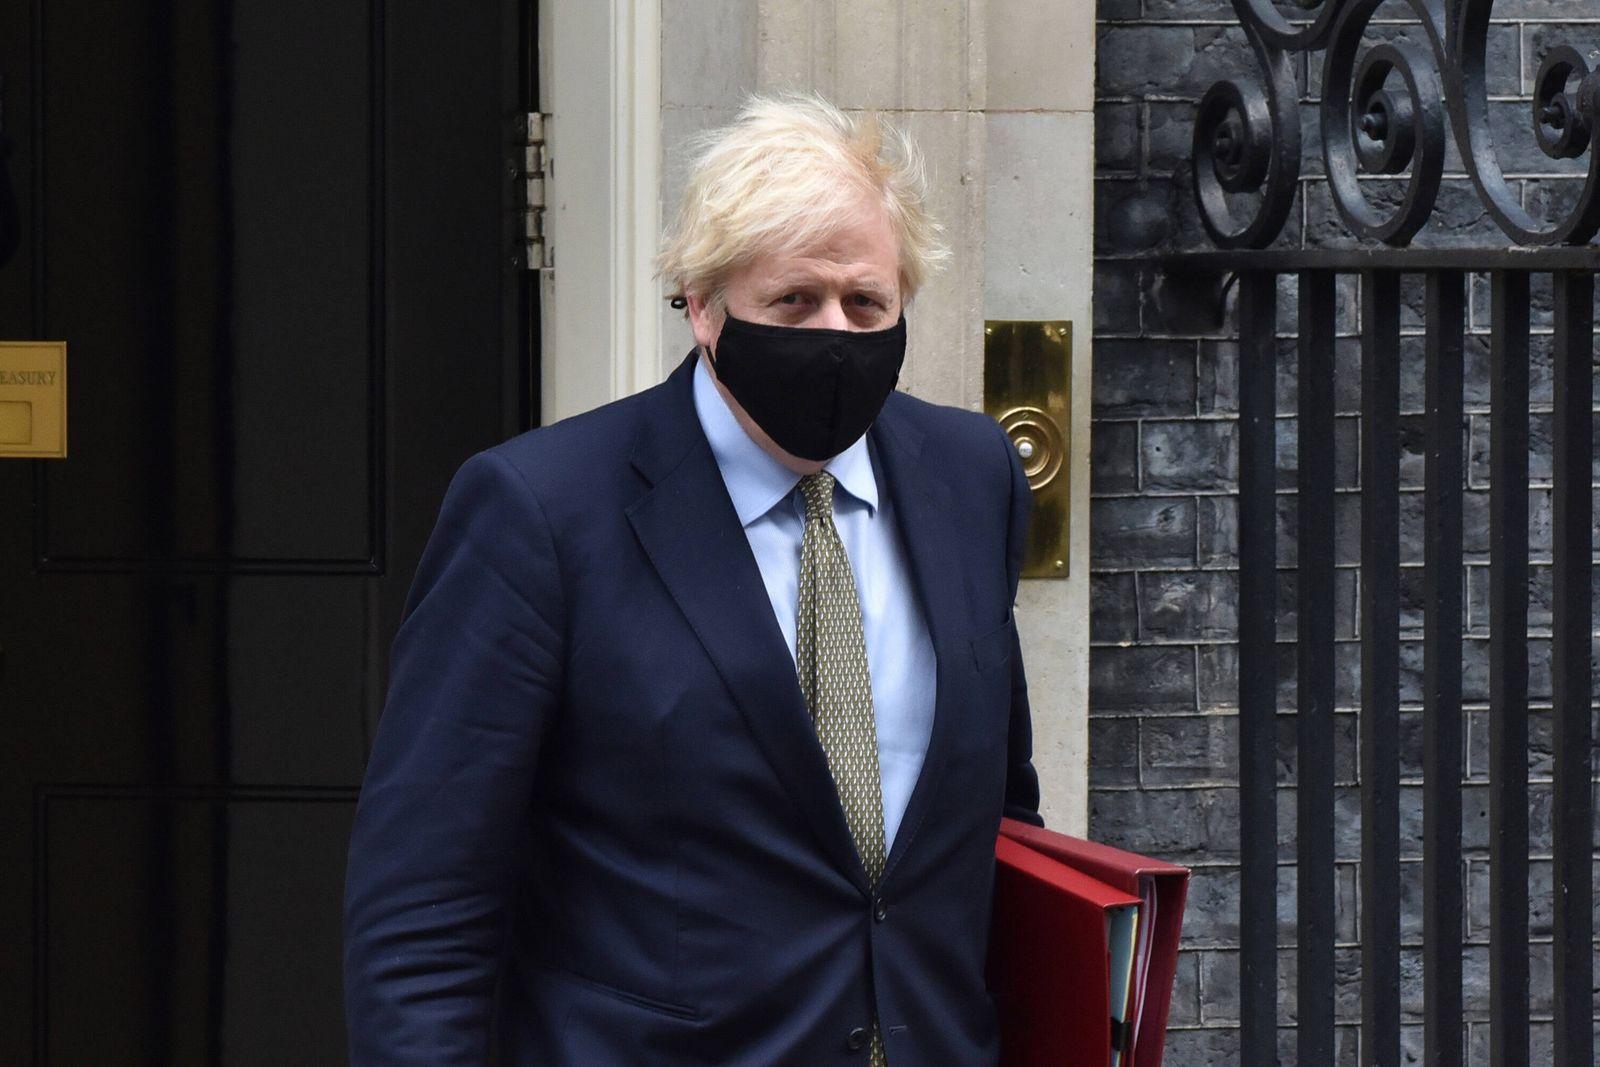 October 14, 2020, London, United Kingdom: British Prime Minister, Boris Johnson leaving Downing Street in London to atte